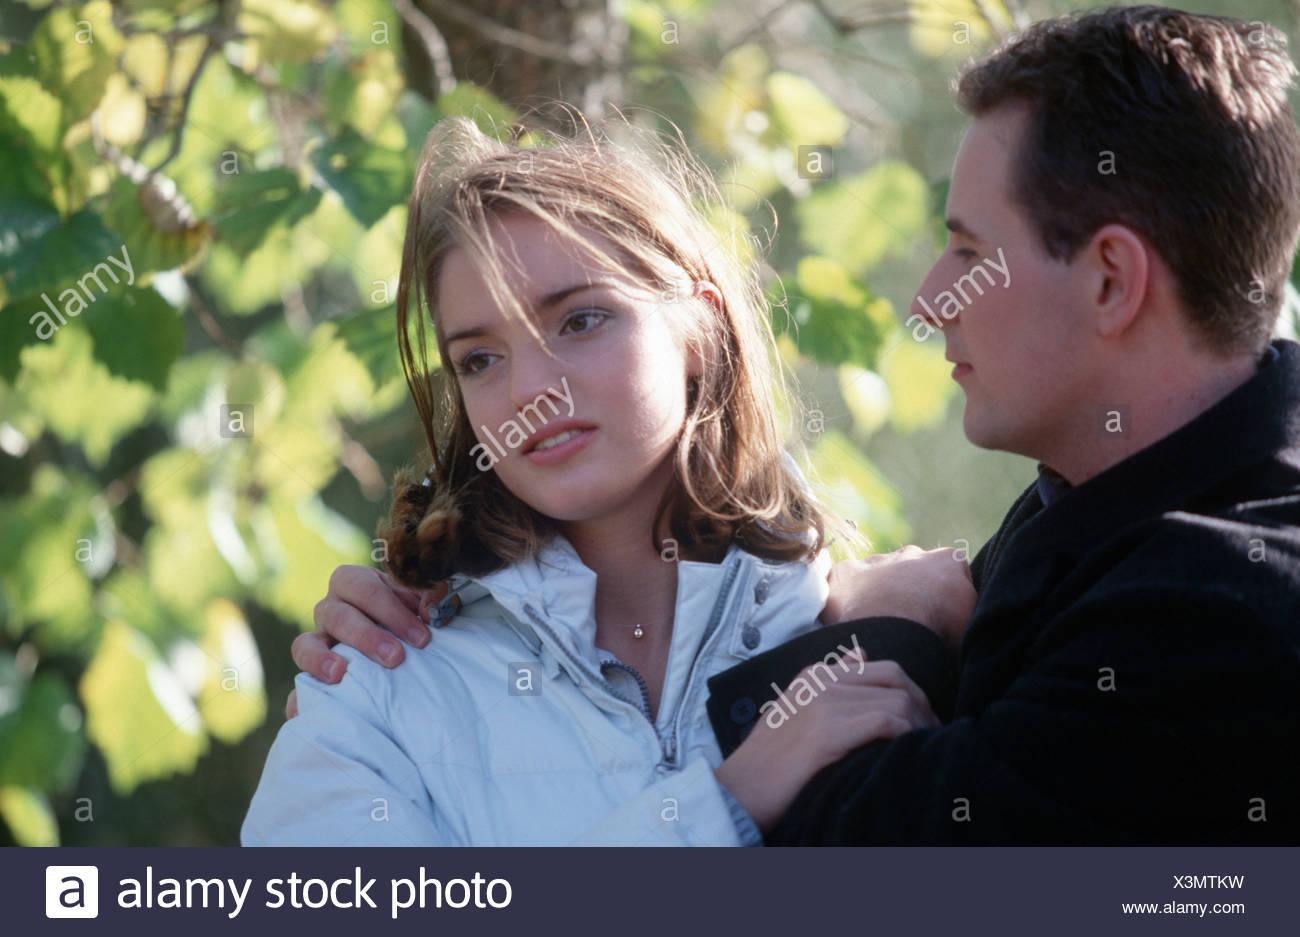 Young man comforting angry girlfriend SerieCVS100024117 - Stock Image